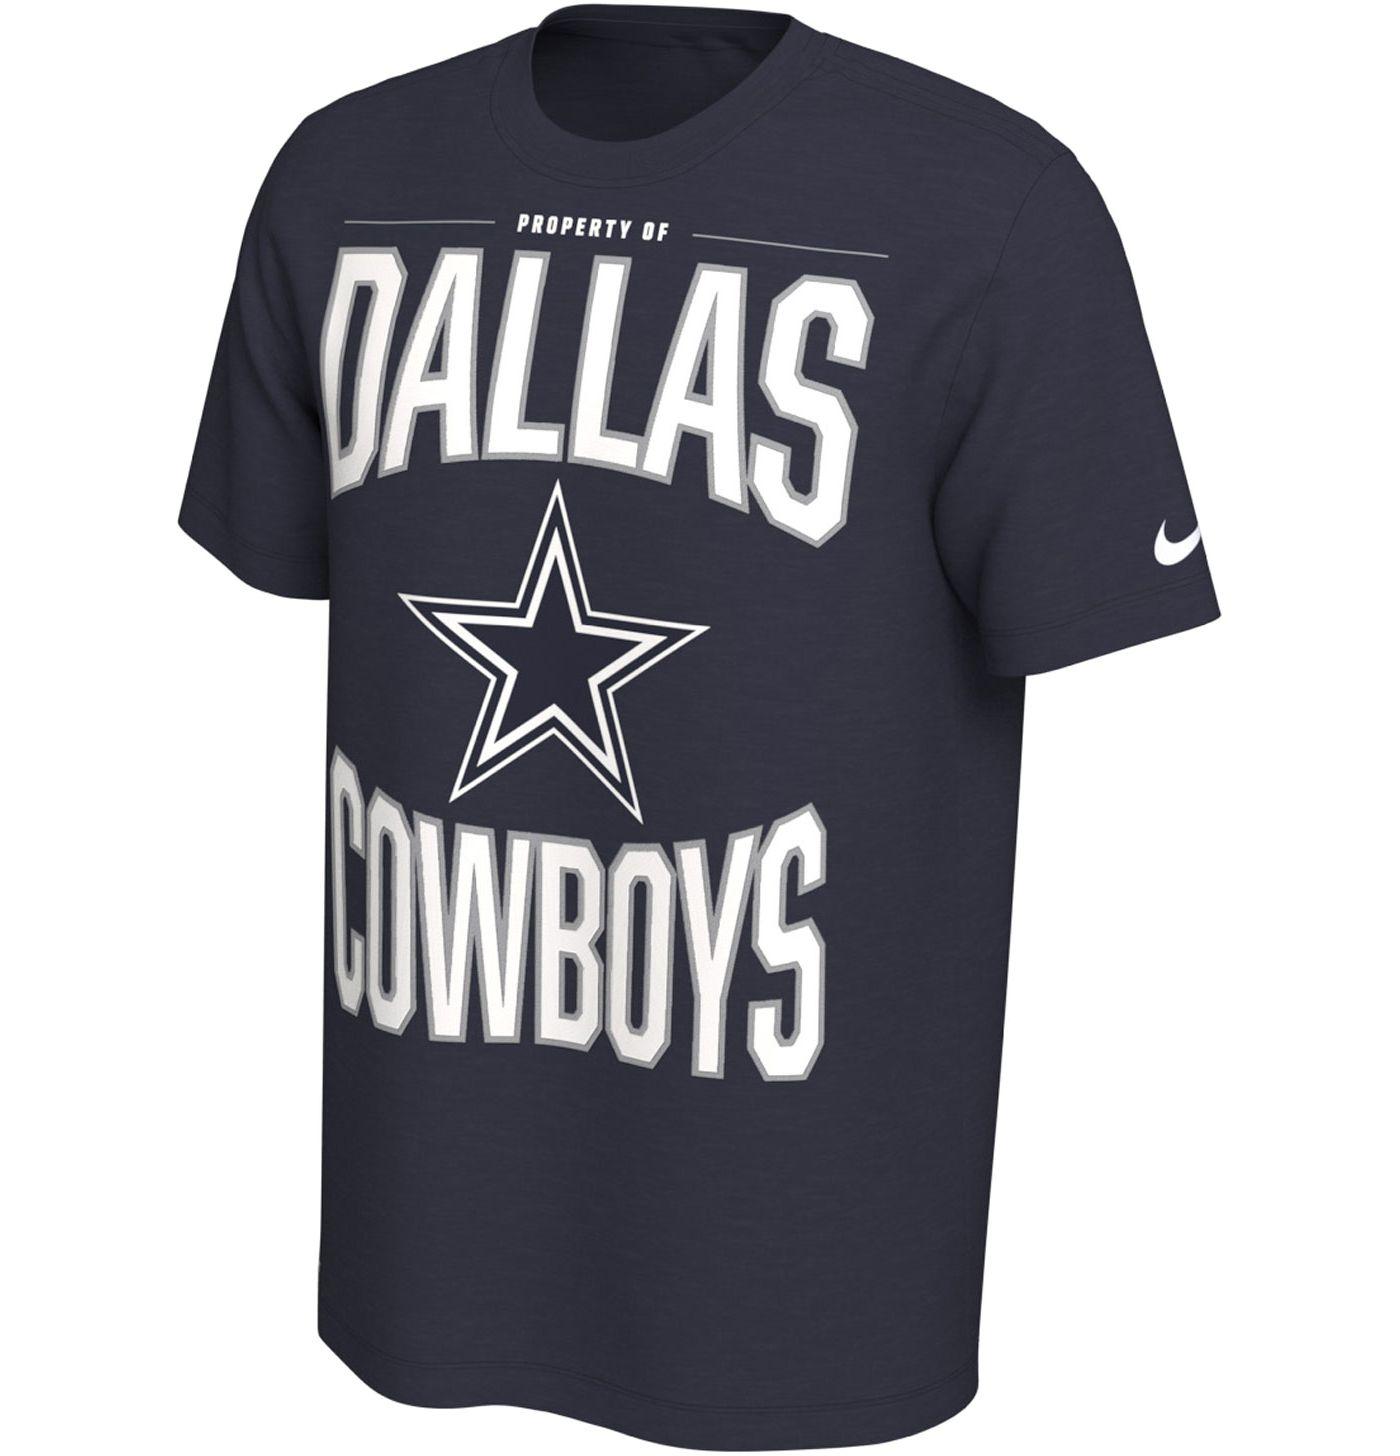 Nike Men's Dallas Cowboys Sideline Property Of Navy T-Shirt